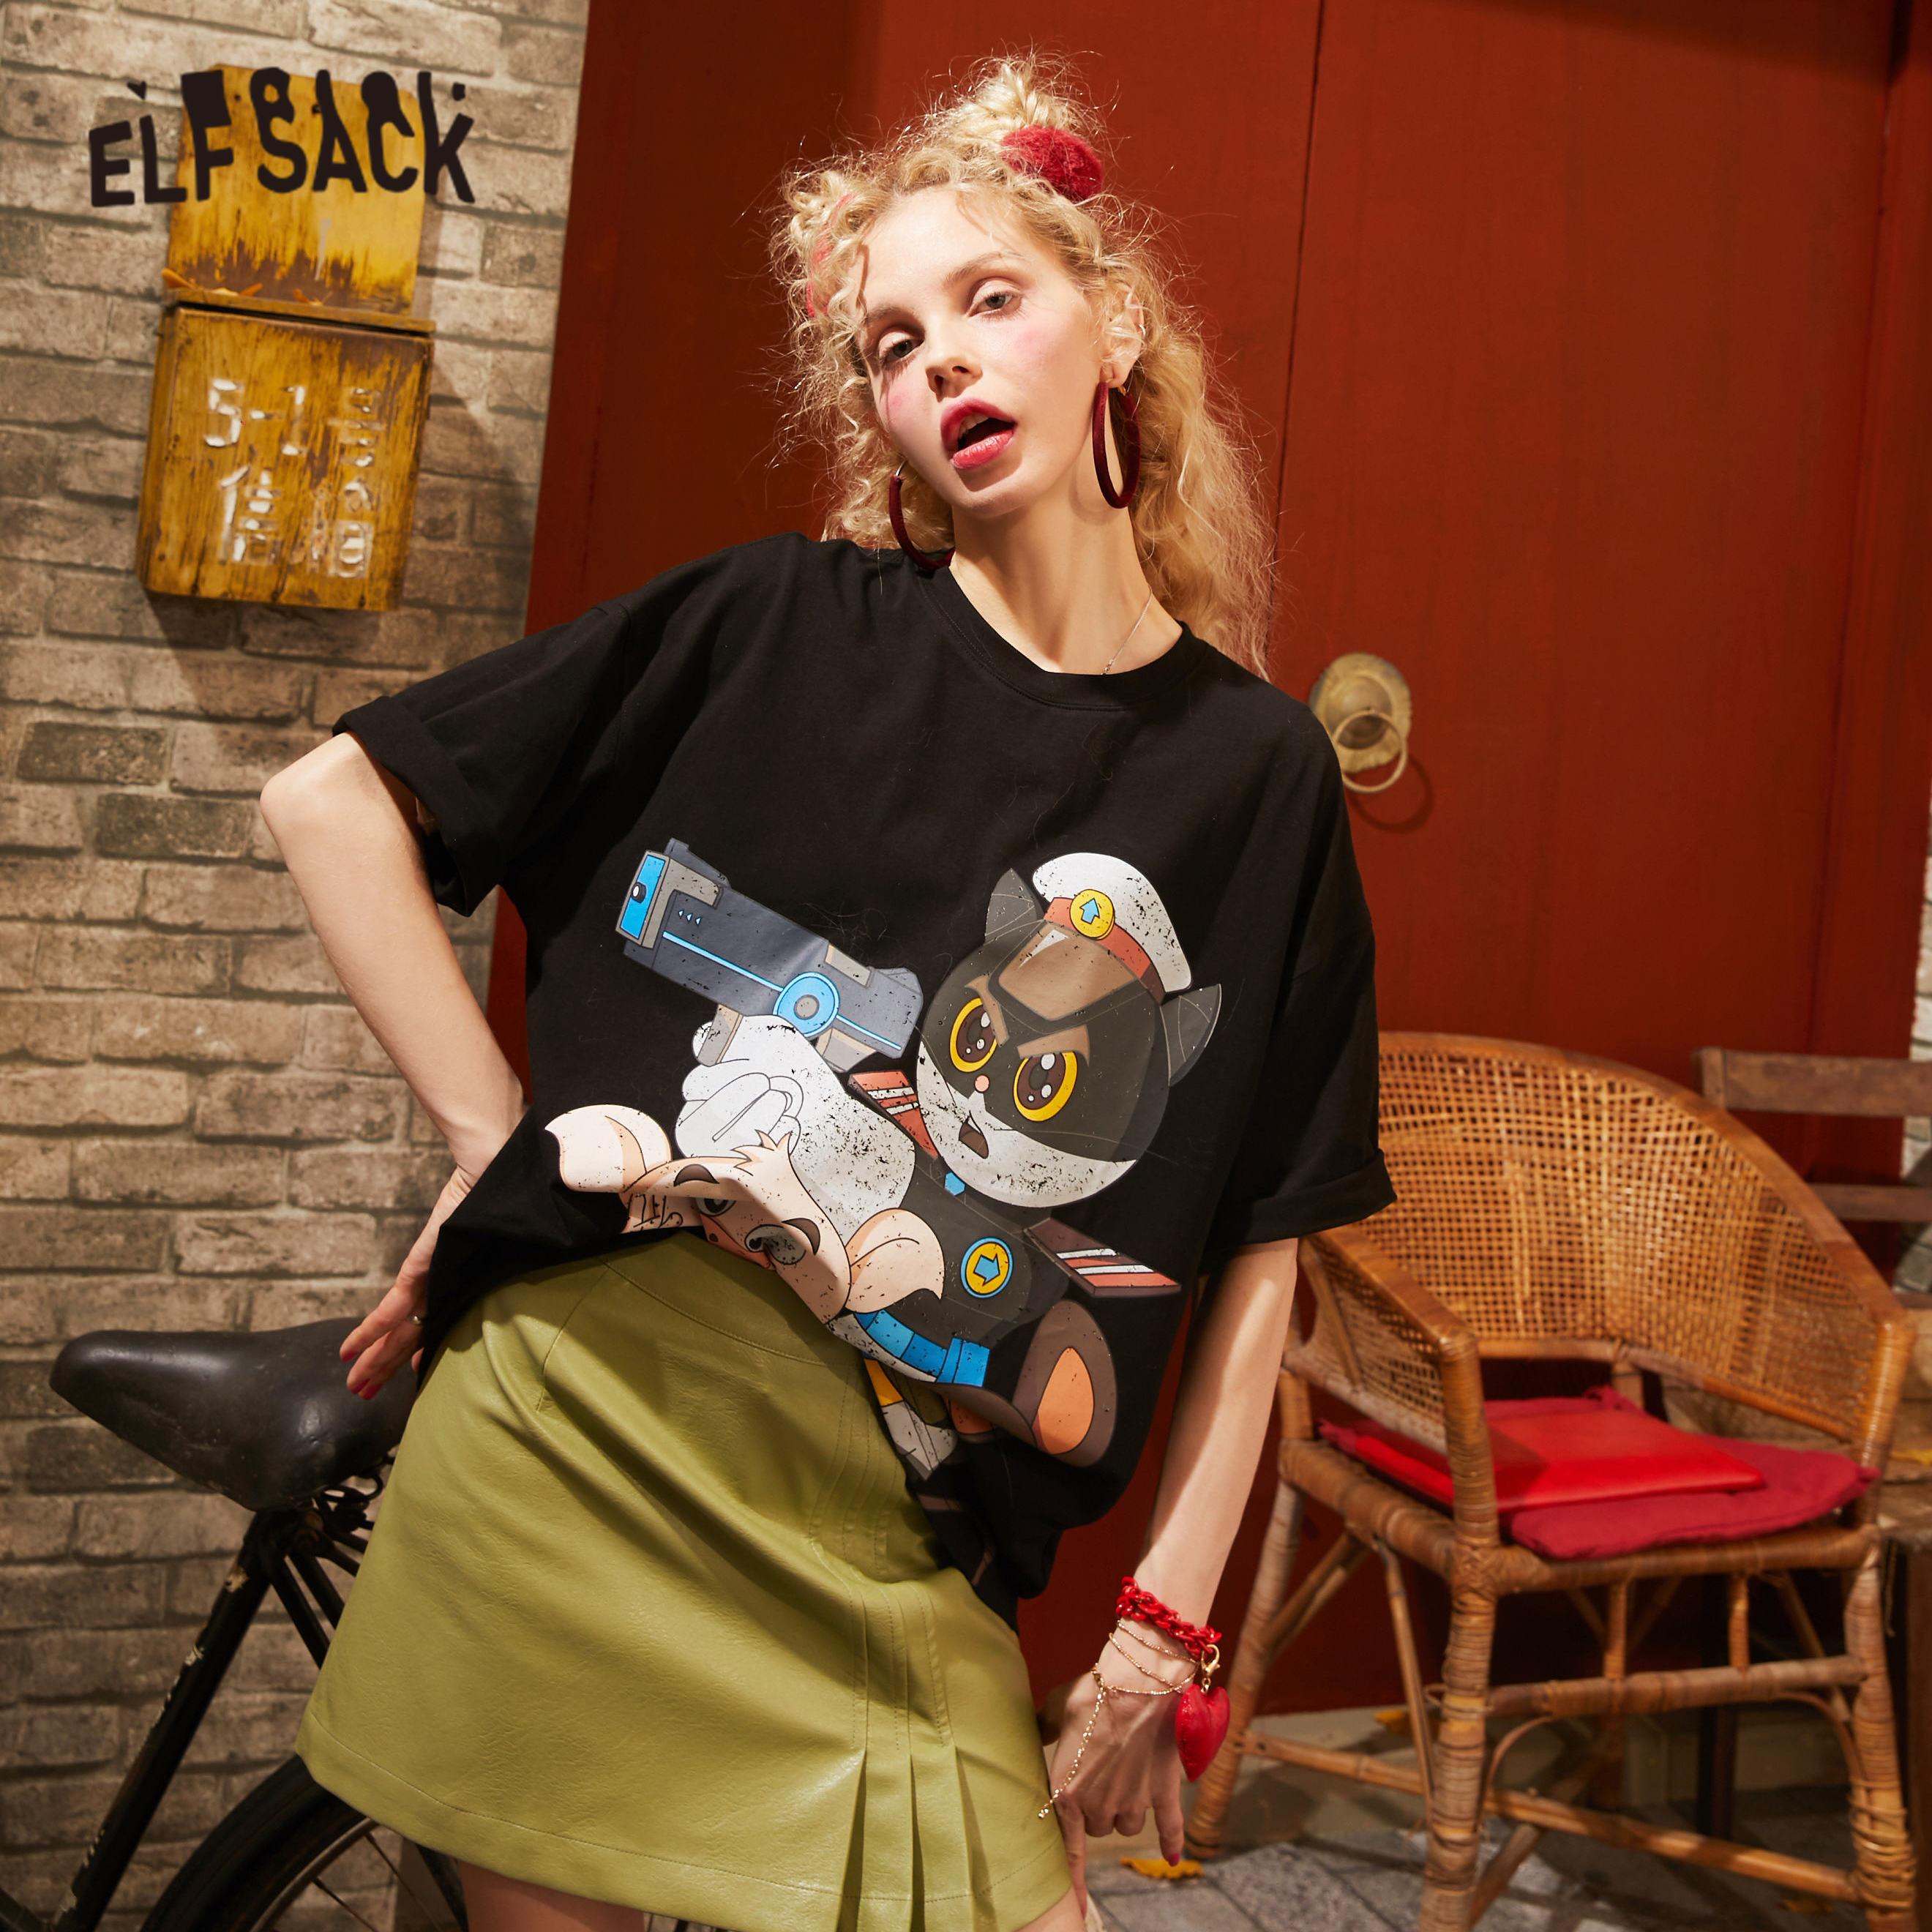 ELFSACK Black Solid Cartoon Print Casual T Shirts Women 2020 Spring New Short Sleeve Korean Style Ladies Basic Daily Tops